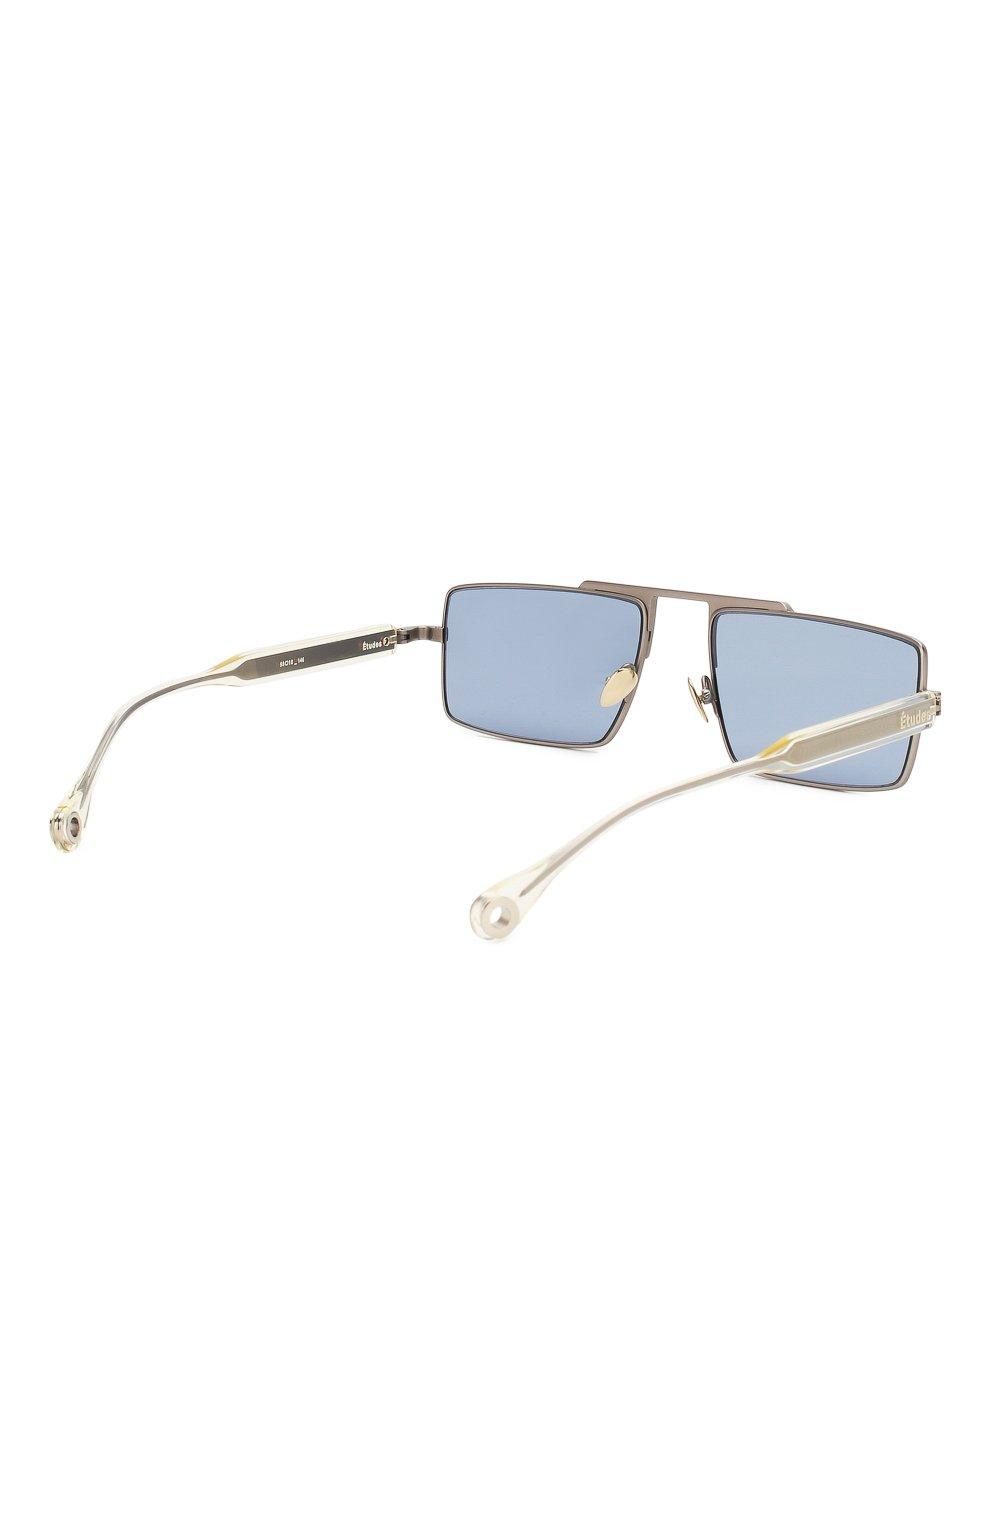 Женские солнцезащитные очки ÉTUDES серебряного цвета, арт. EASTERN SILVER CH WITH CHAIN   Фото 5